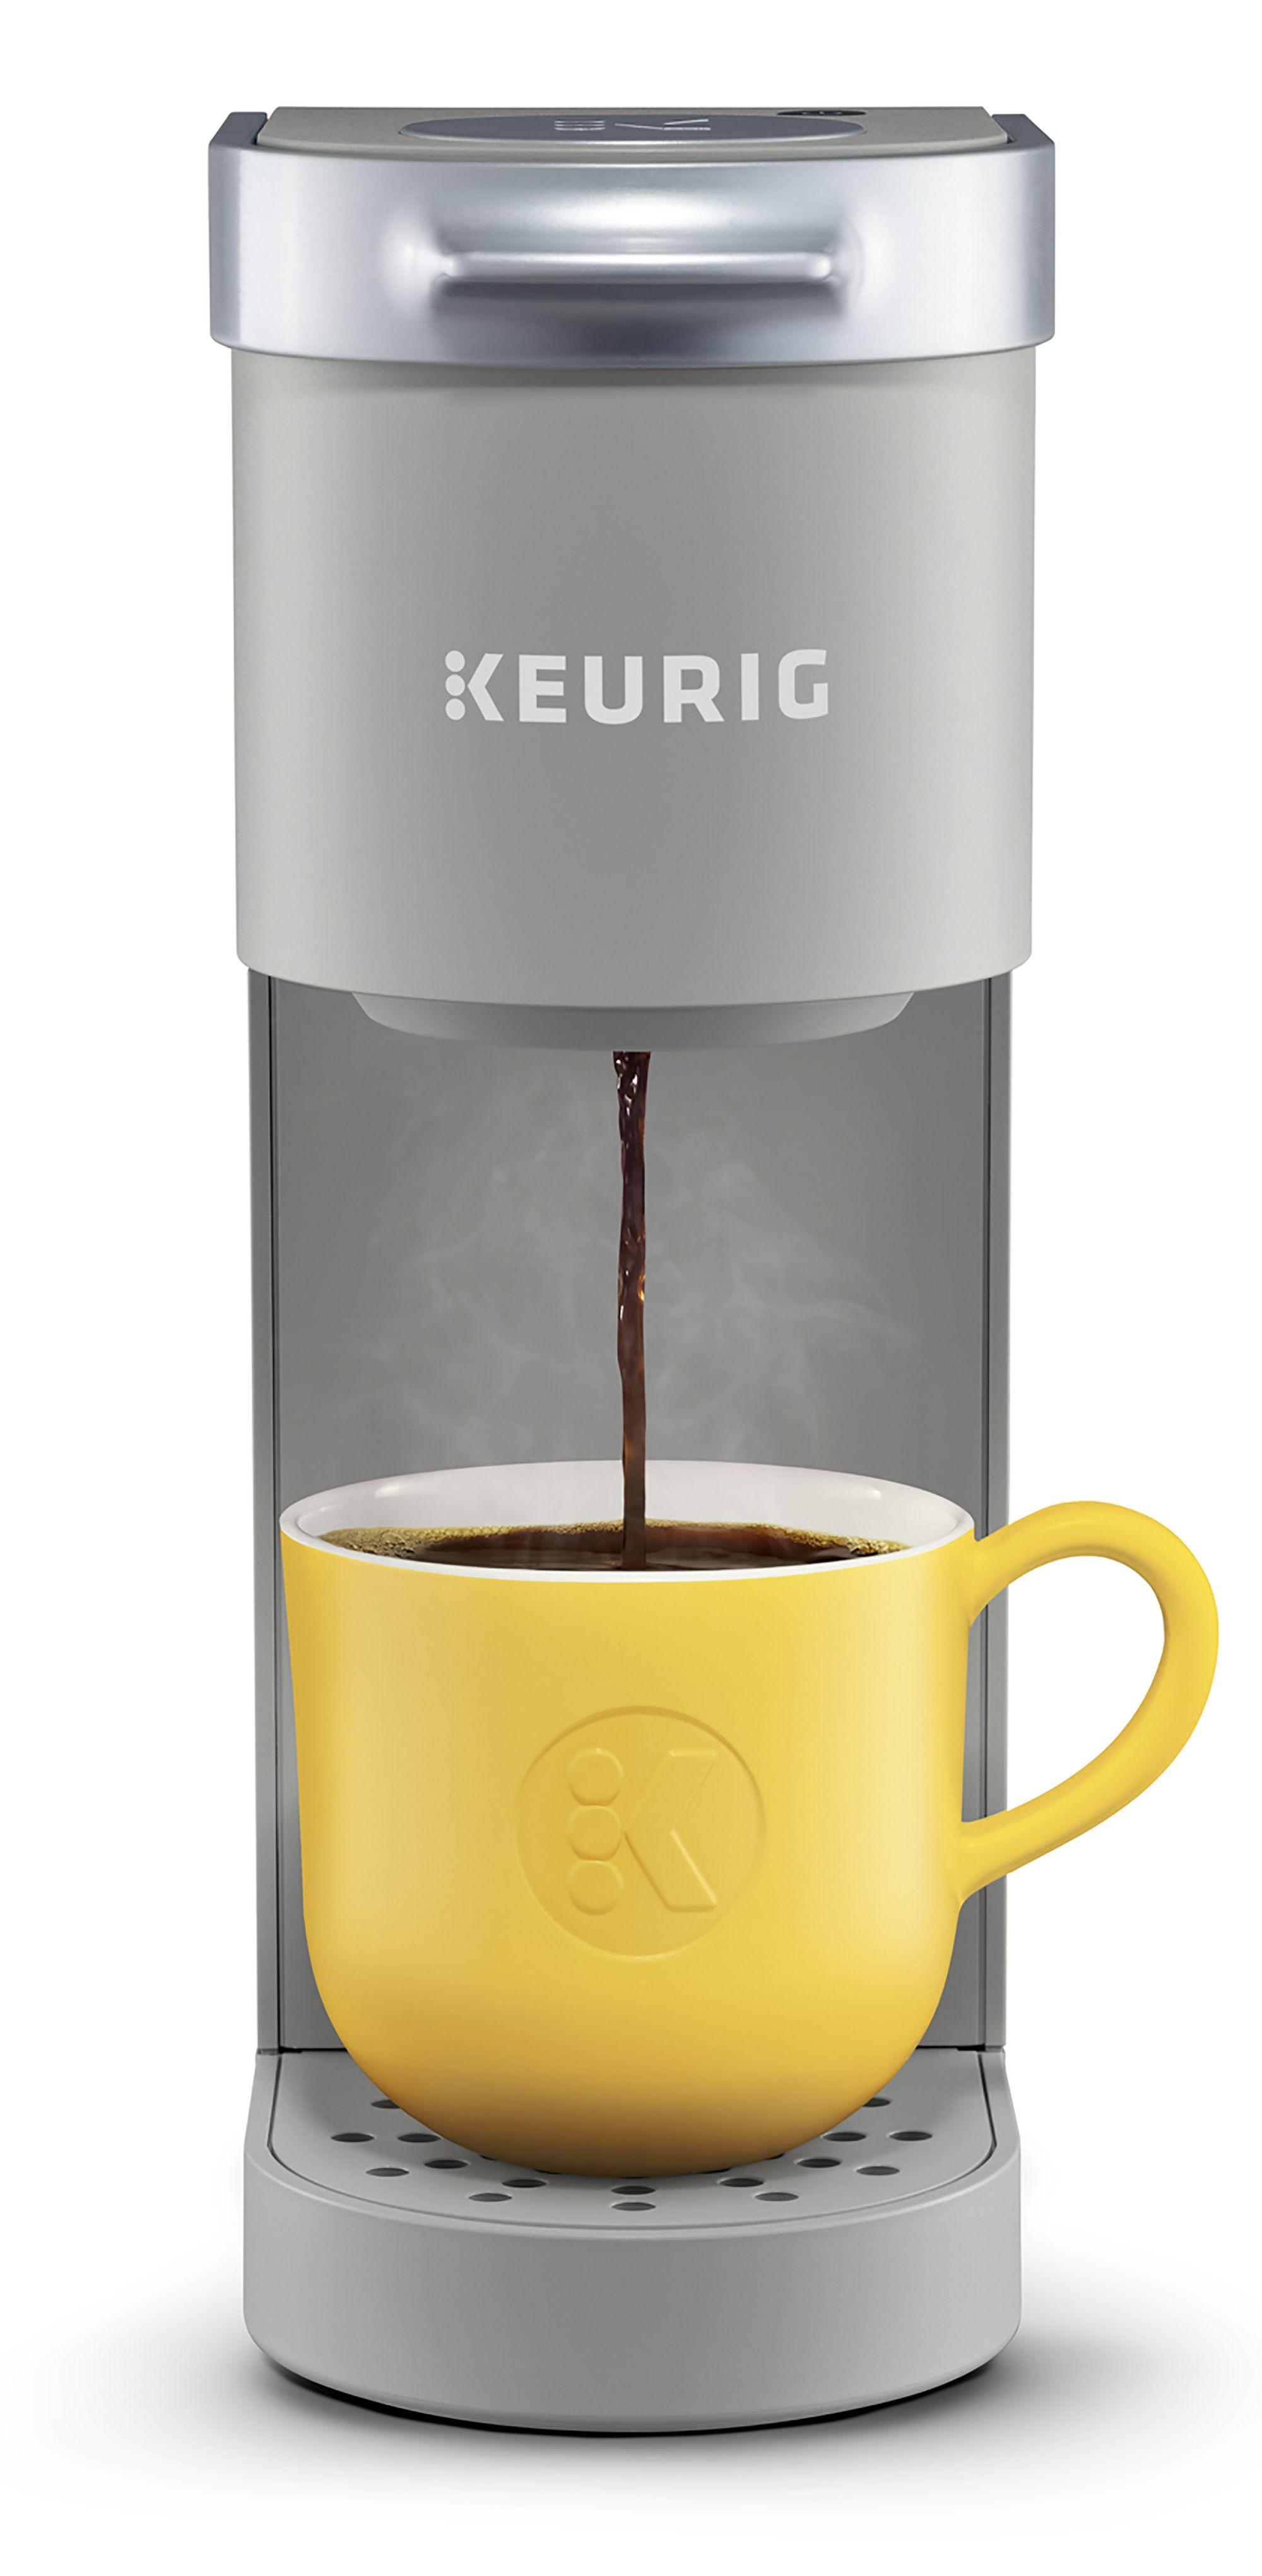 Keurig K Mini Single Serve K Cup Pod Coffee Maker 6 To 12 Oz Brew Sizes Studio Gray Walmart Com In 2020 Best Coffee Maker Keurig Coffee Makers Coffee Maker